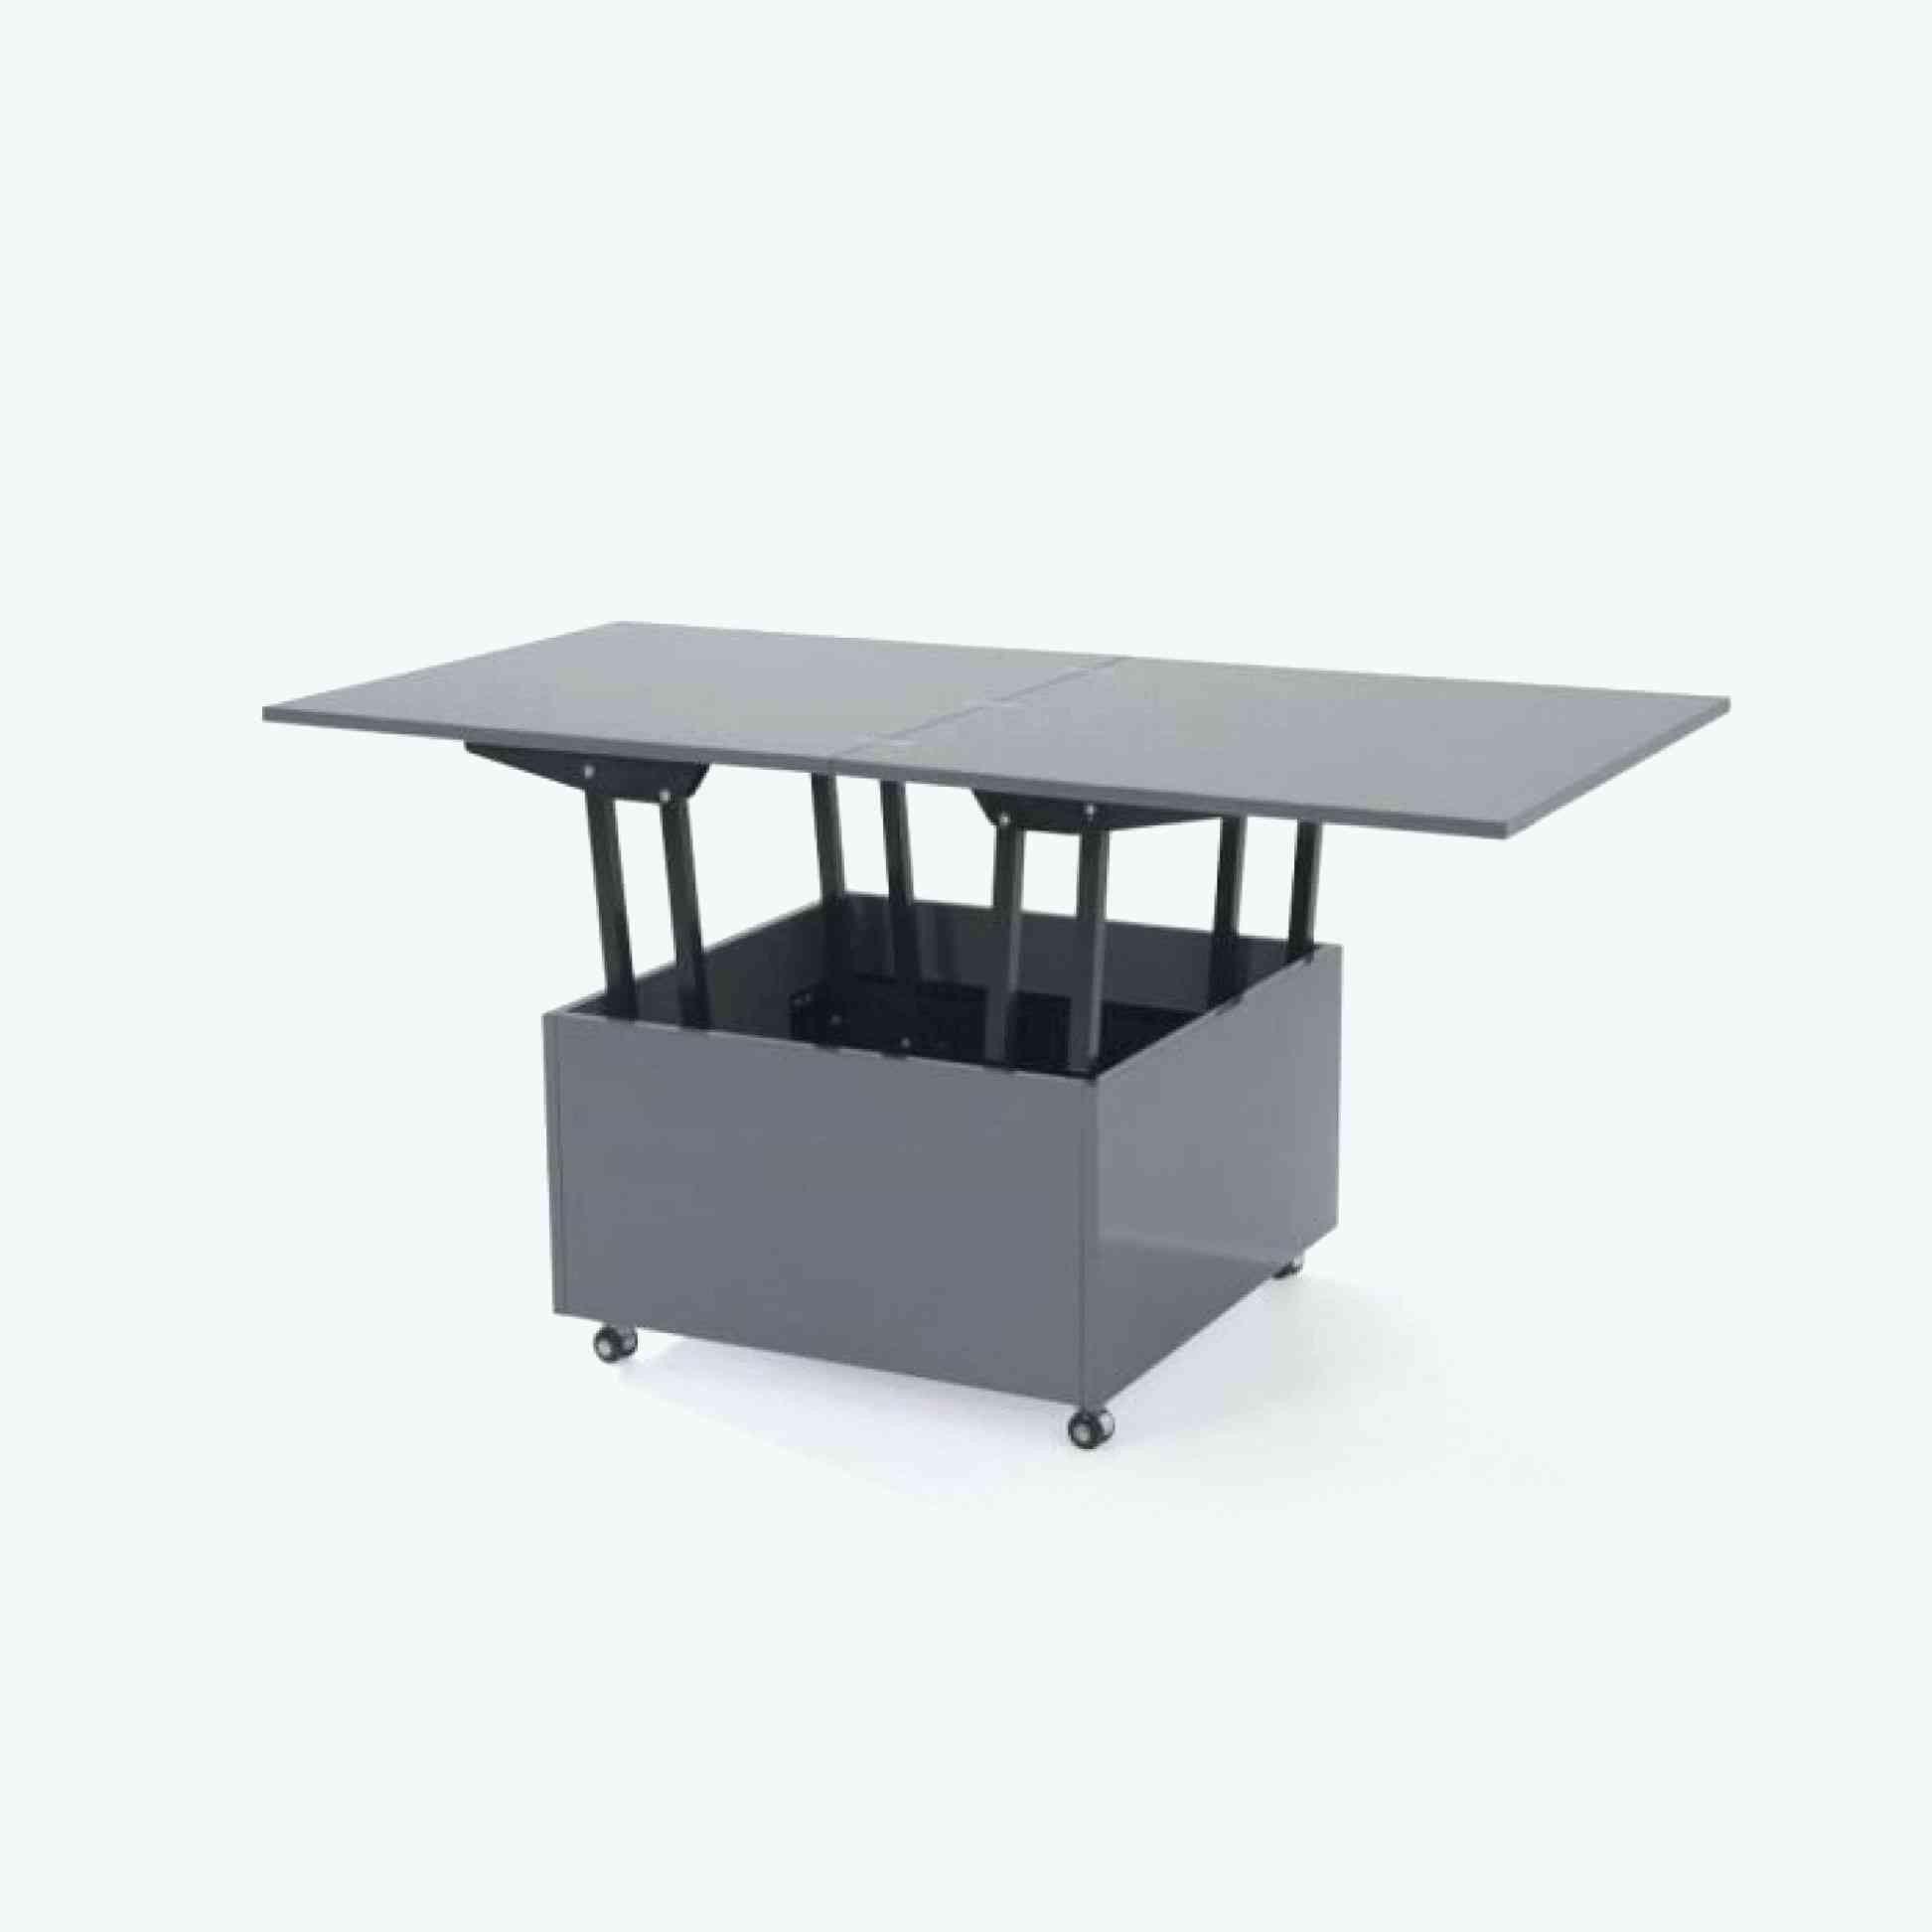 Elegant Cuisine Noir Mat Ikea  Clear coffee table, Coffee table